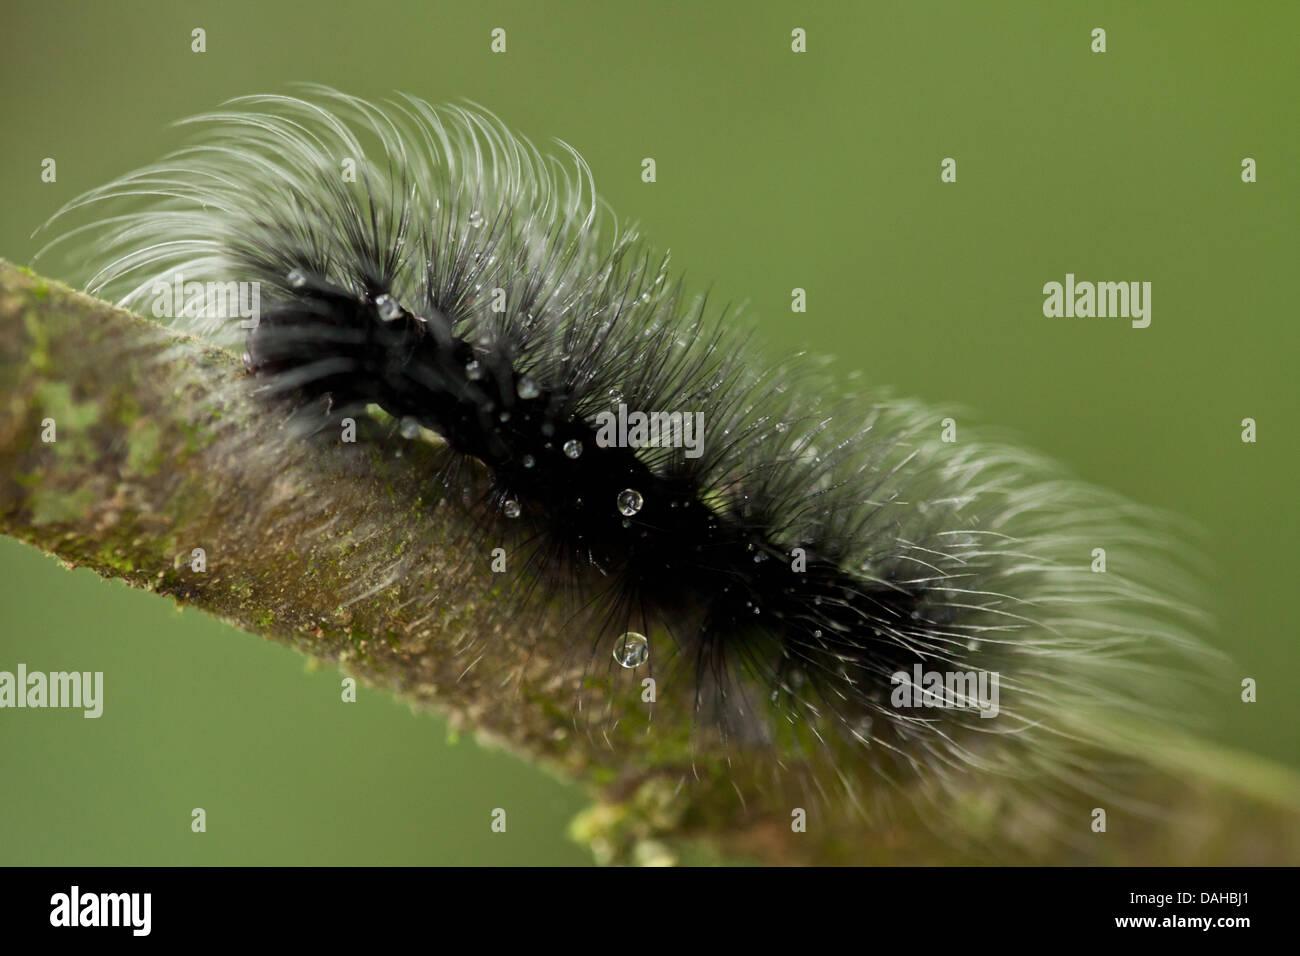 Hairy caterpillar in the rainforest of Altos de Campana National Park, Panama province, Republic of Panama. - Stock Image